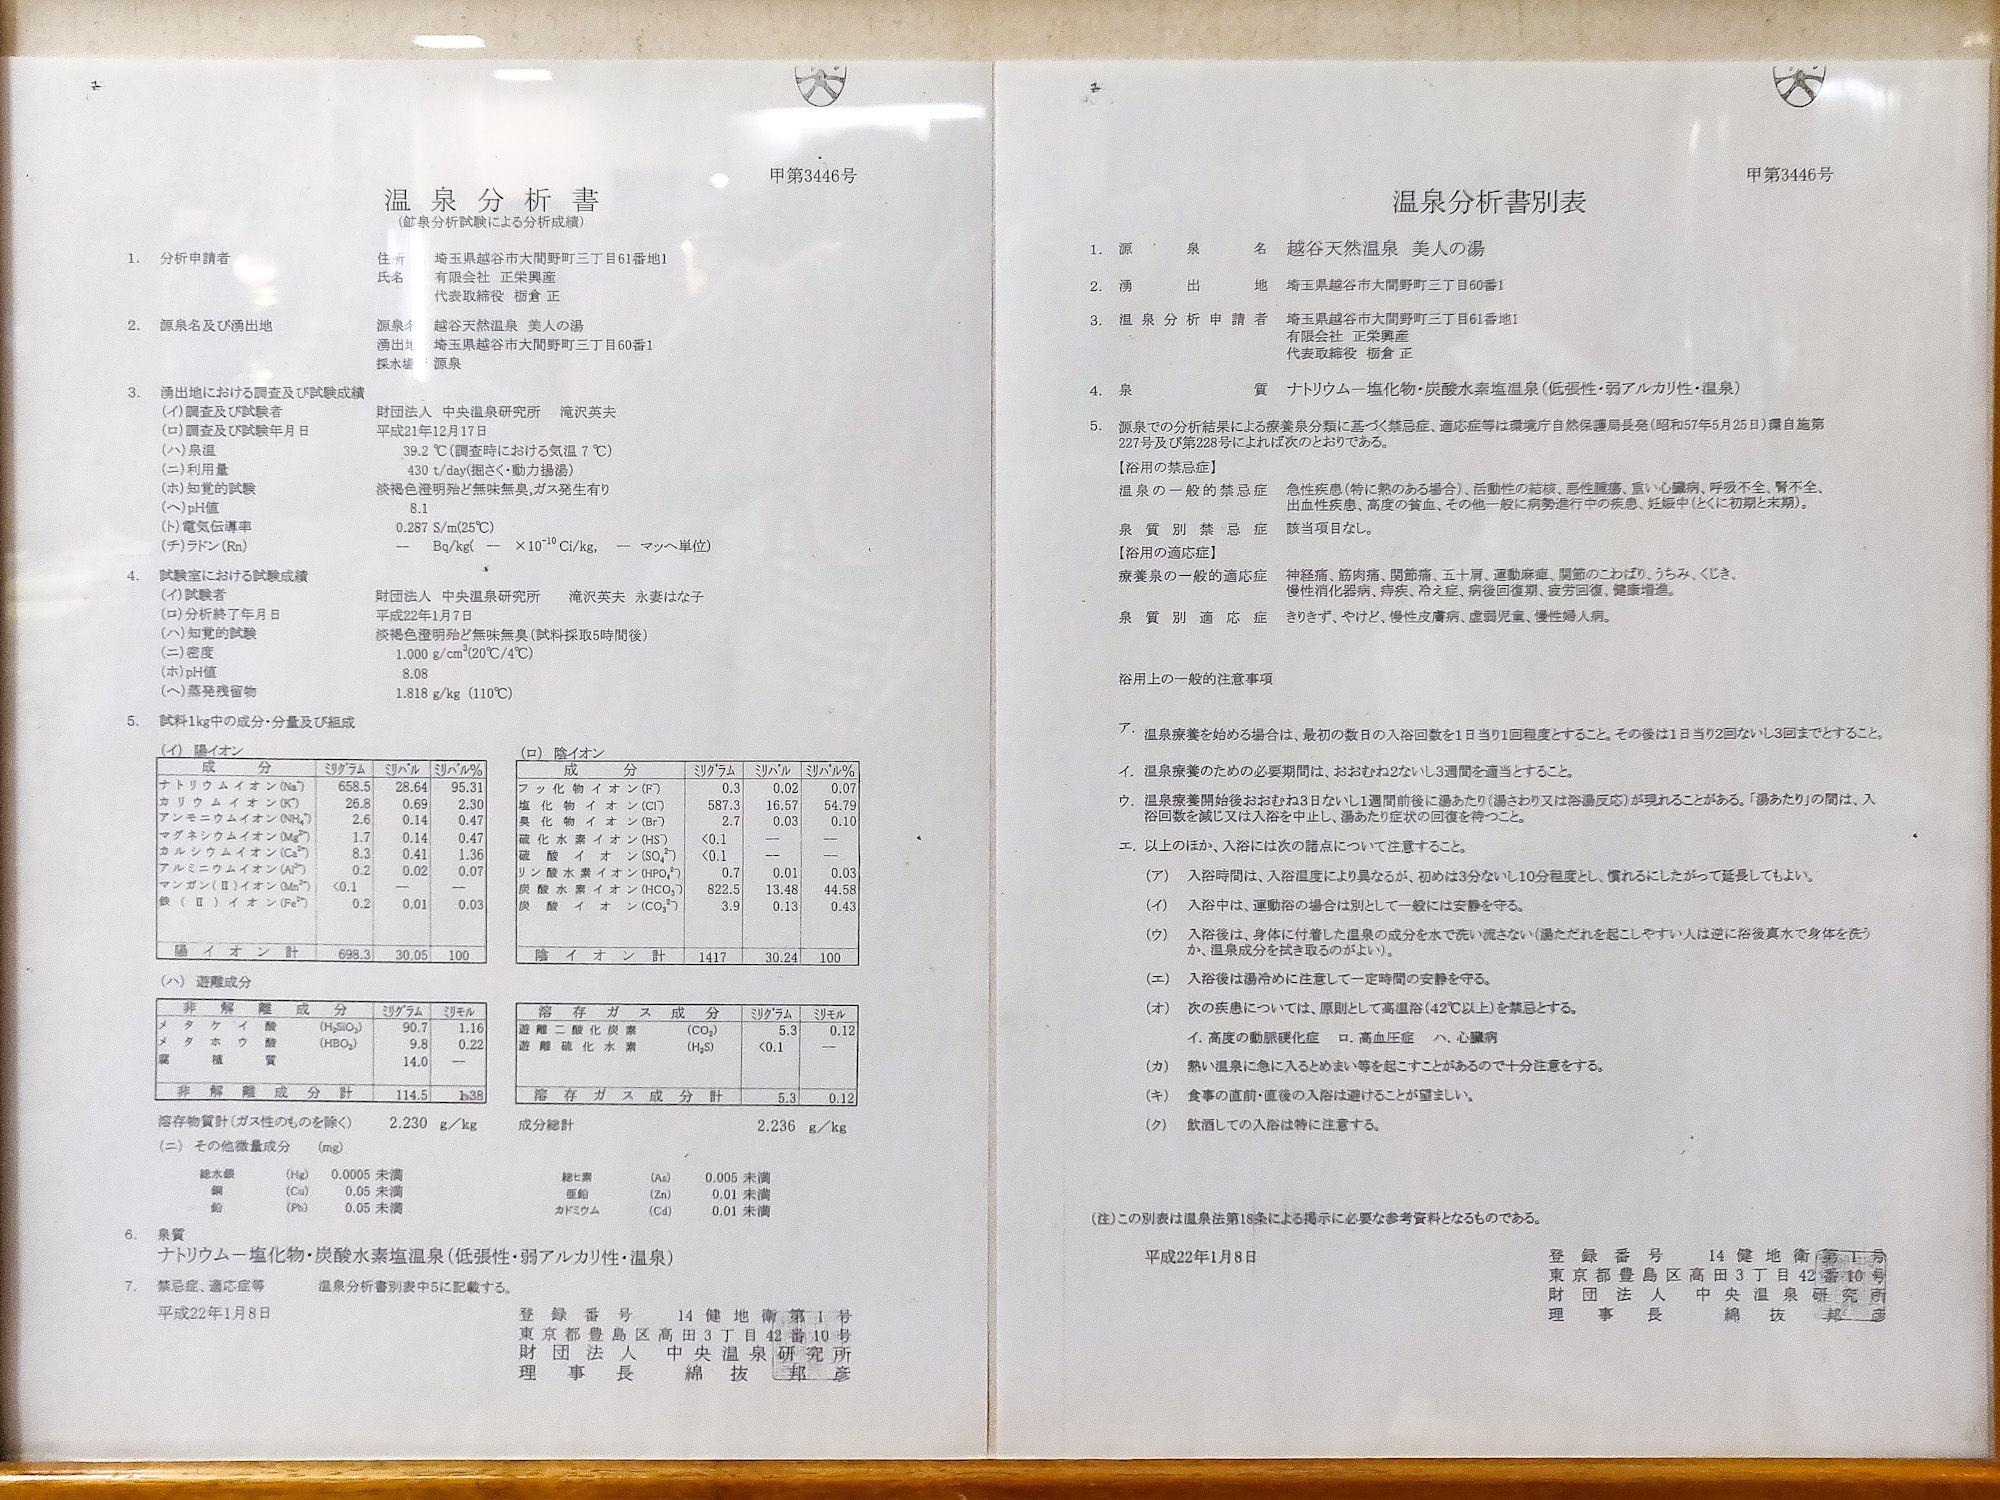 越谷温泉湯の華 温泉分析書